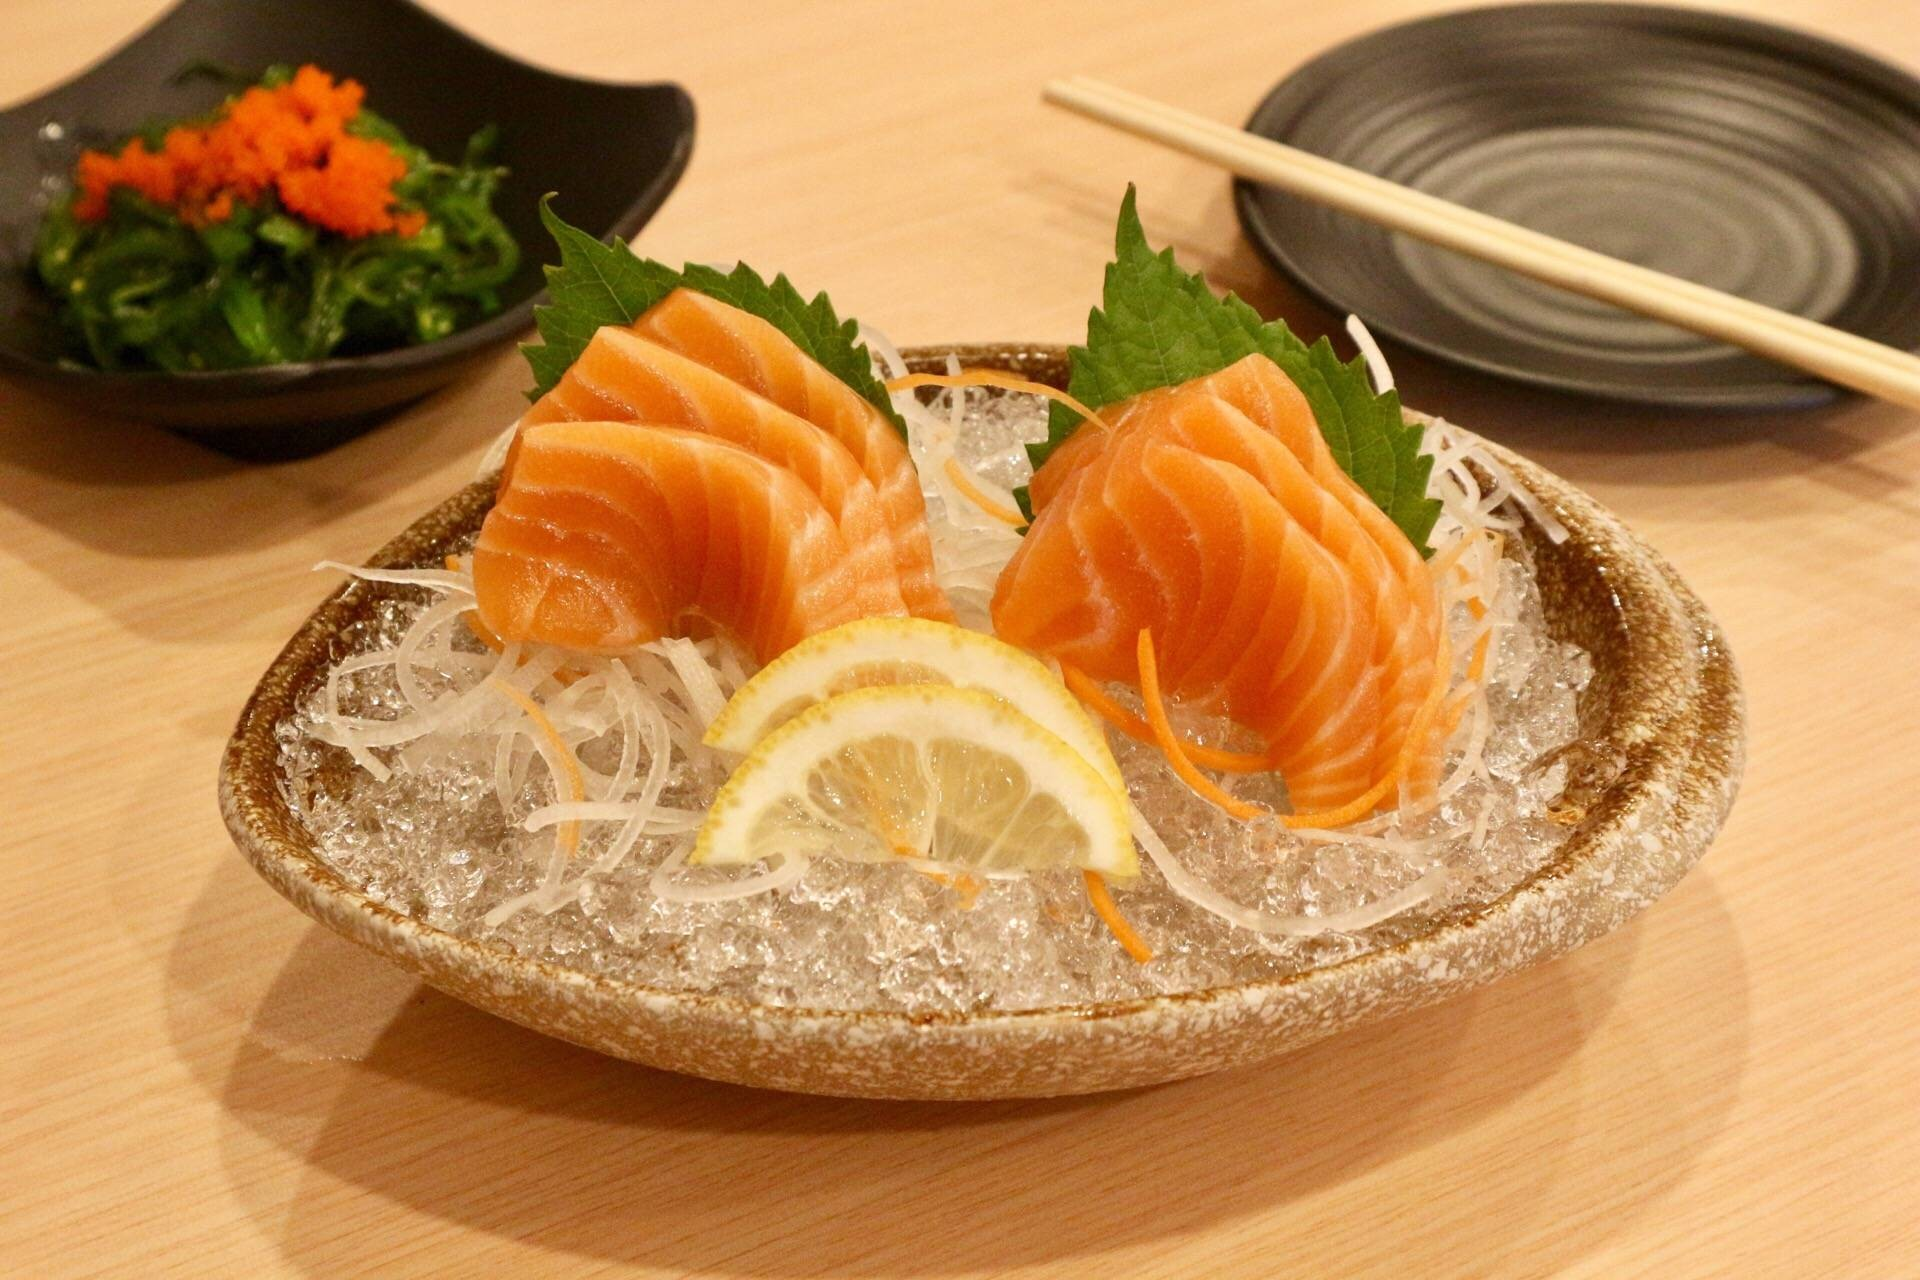 Kyozen sushi market